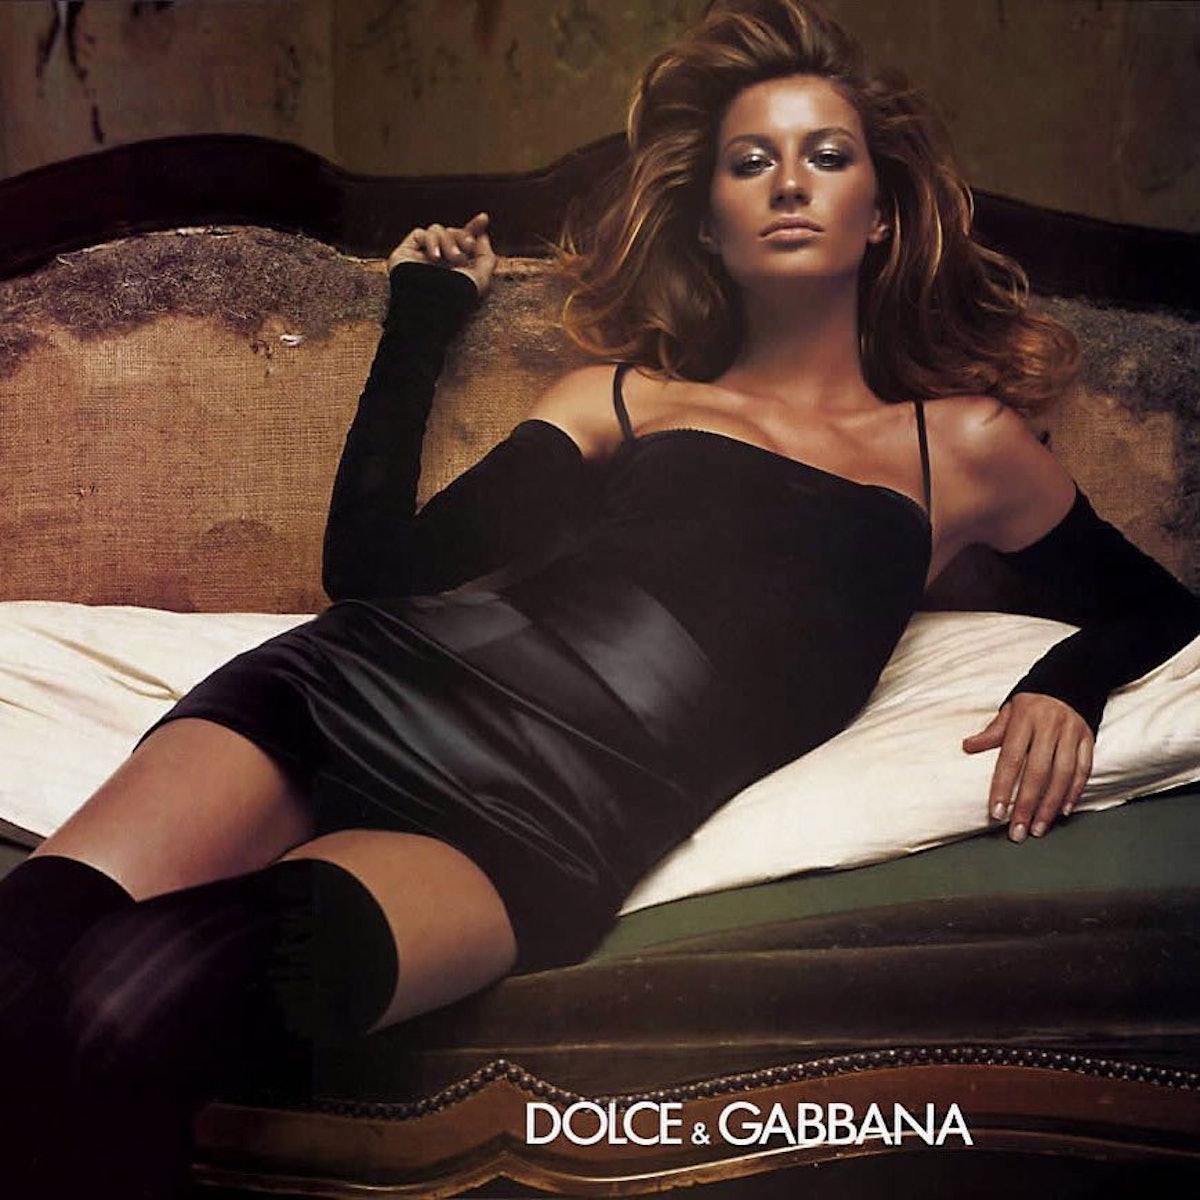 gisele-dolce-campaign.jpg